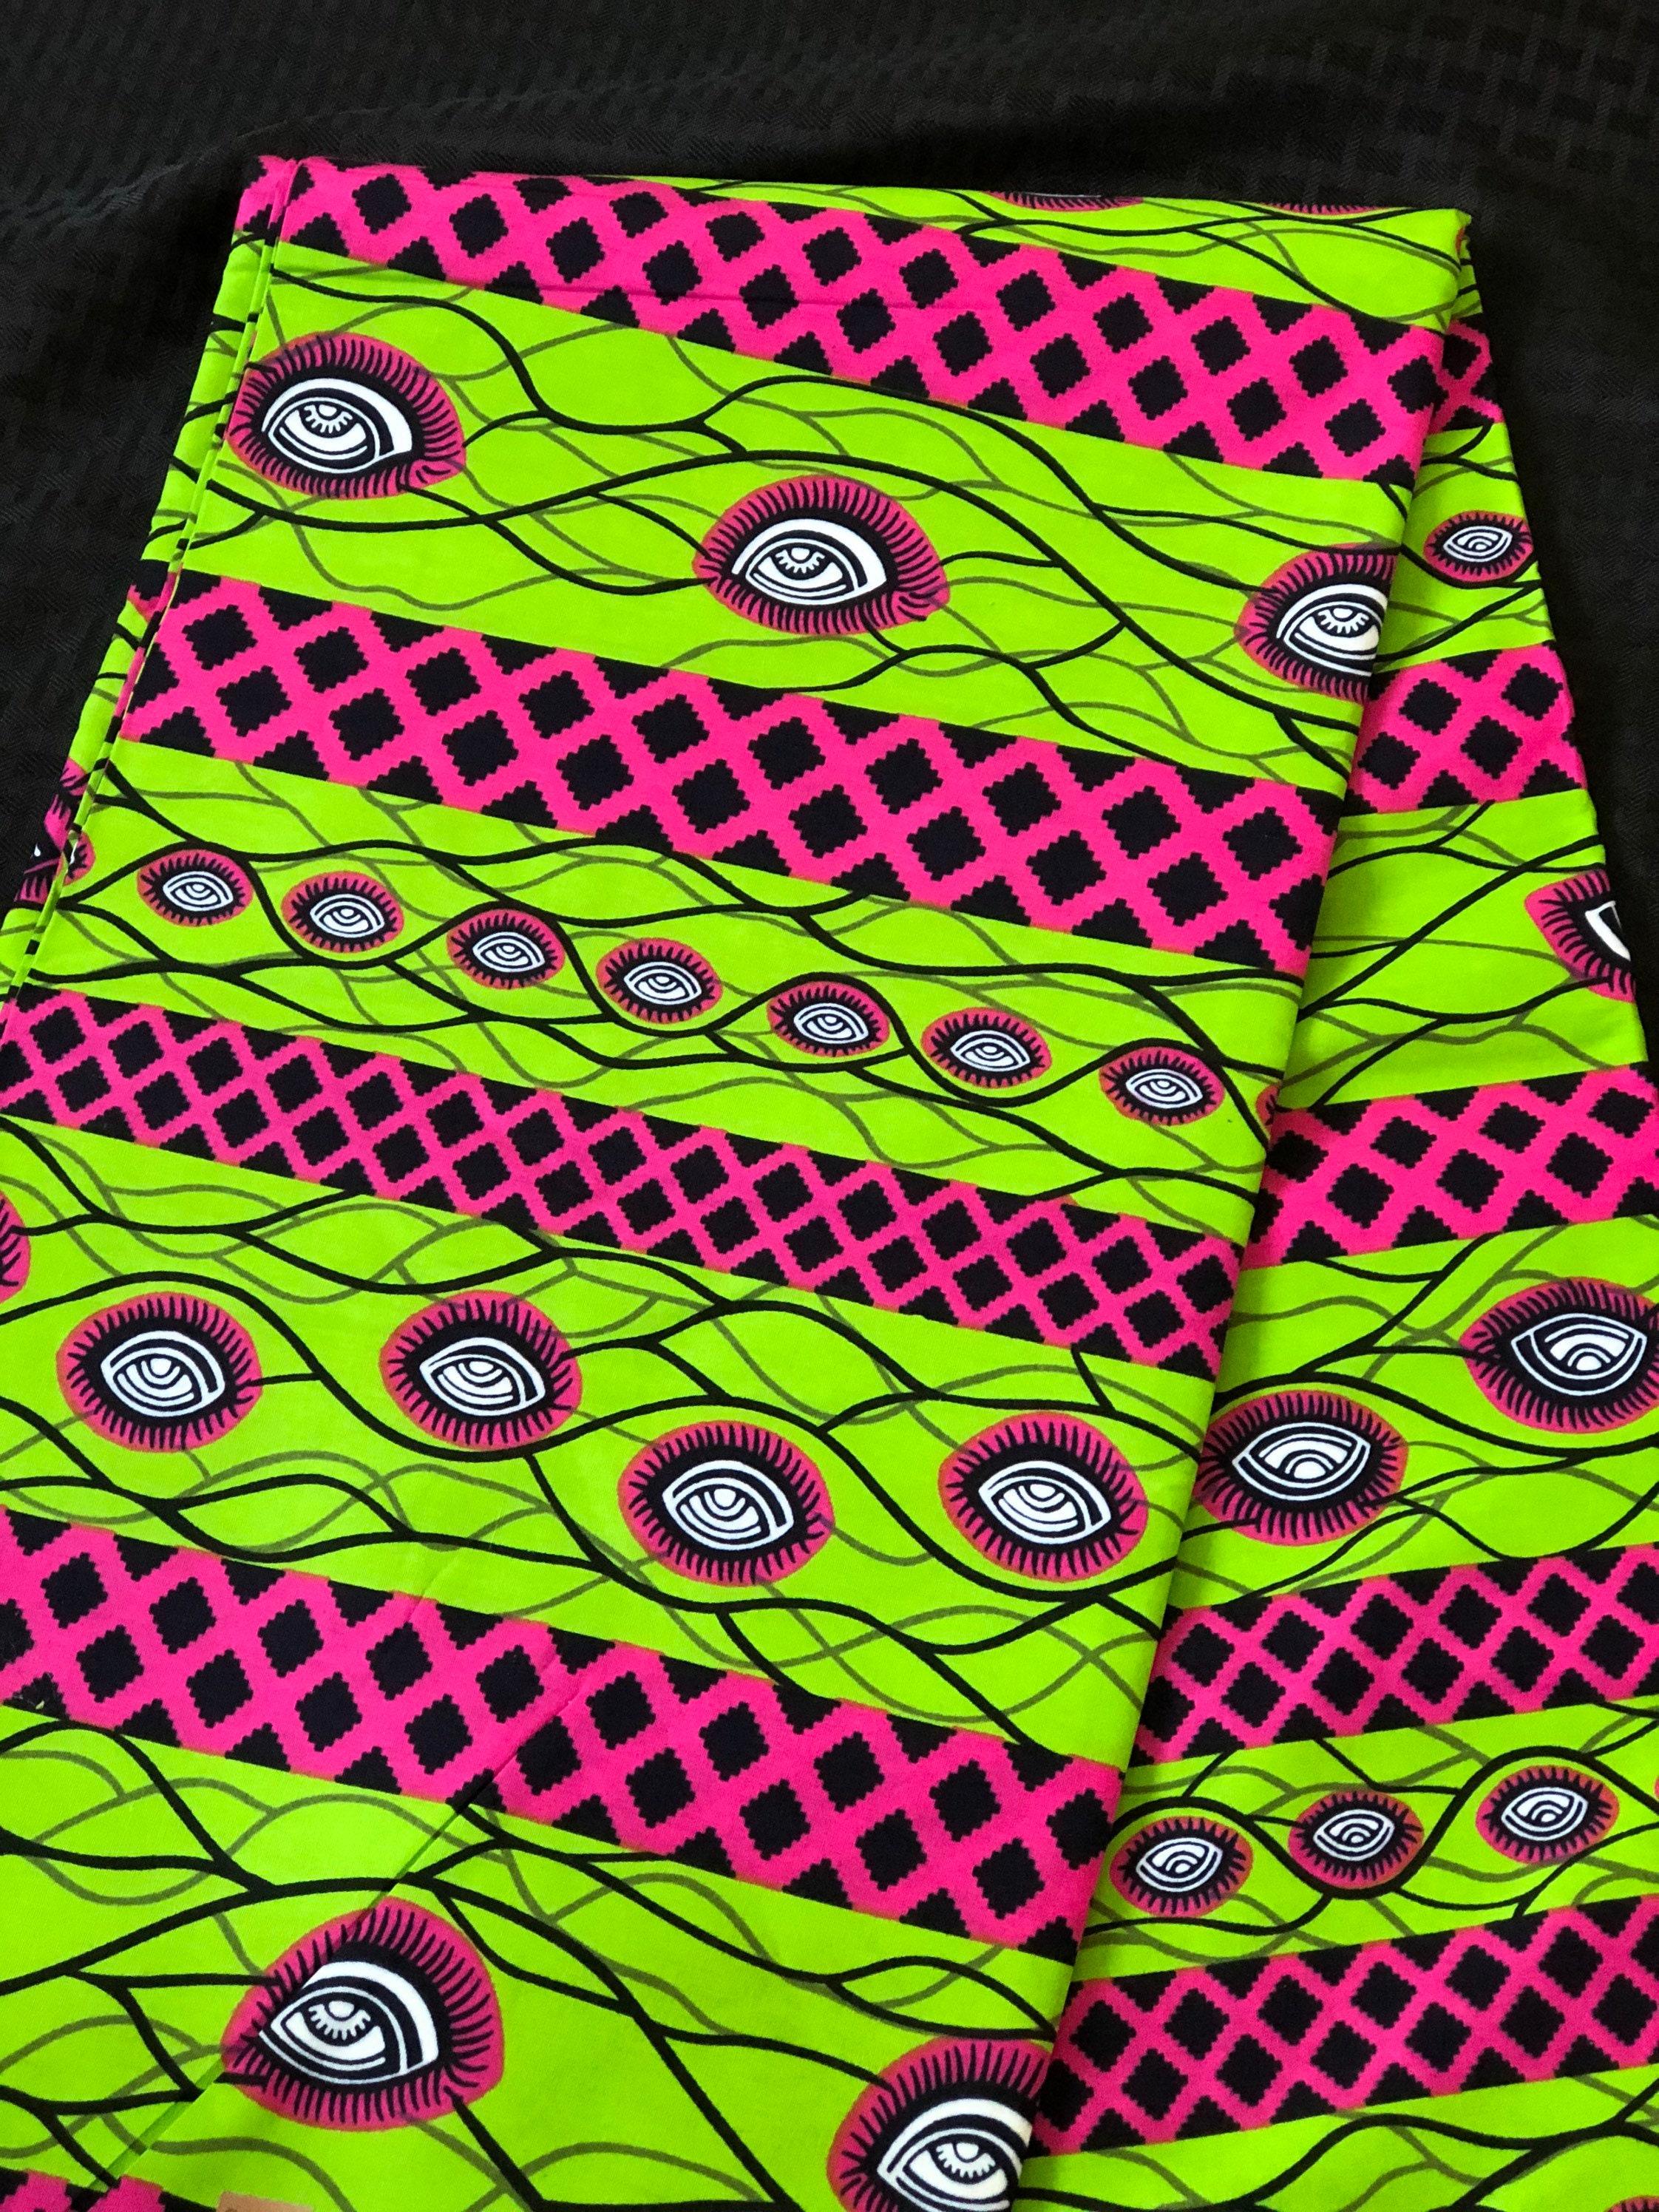 Ak20 african fabric per yard Pink Green African Wax print Ankara African Cloth Material Ghana Nigeria Fabric